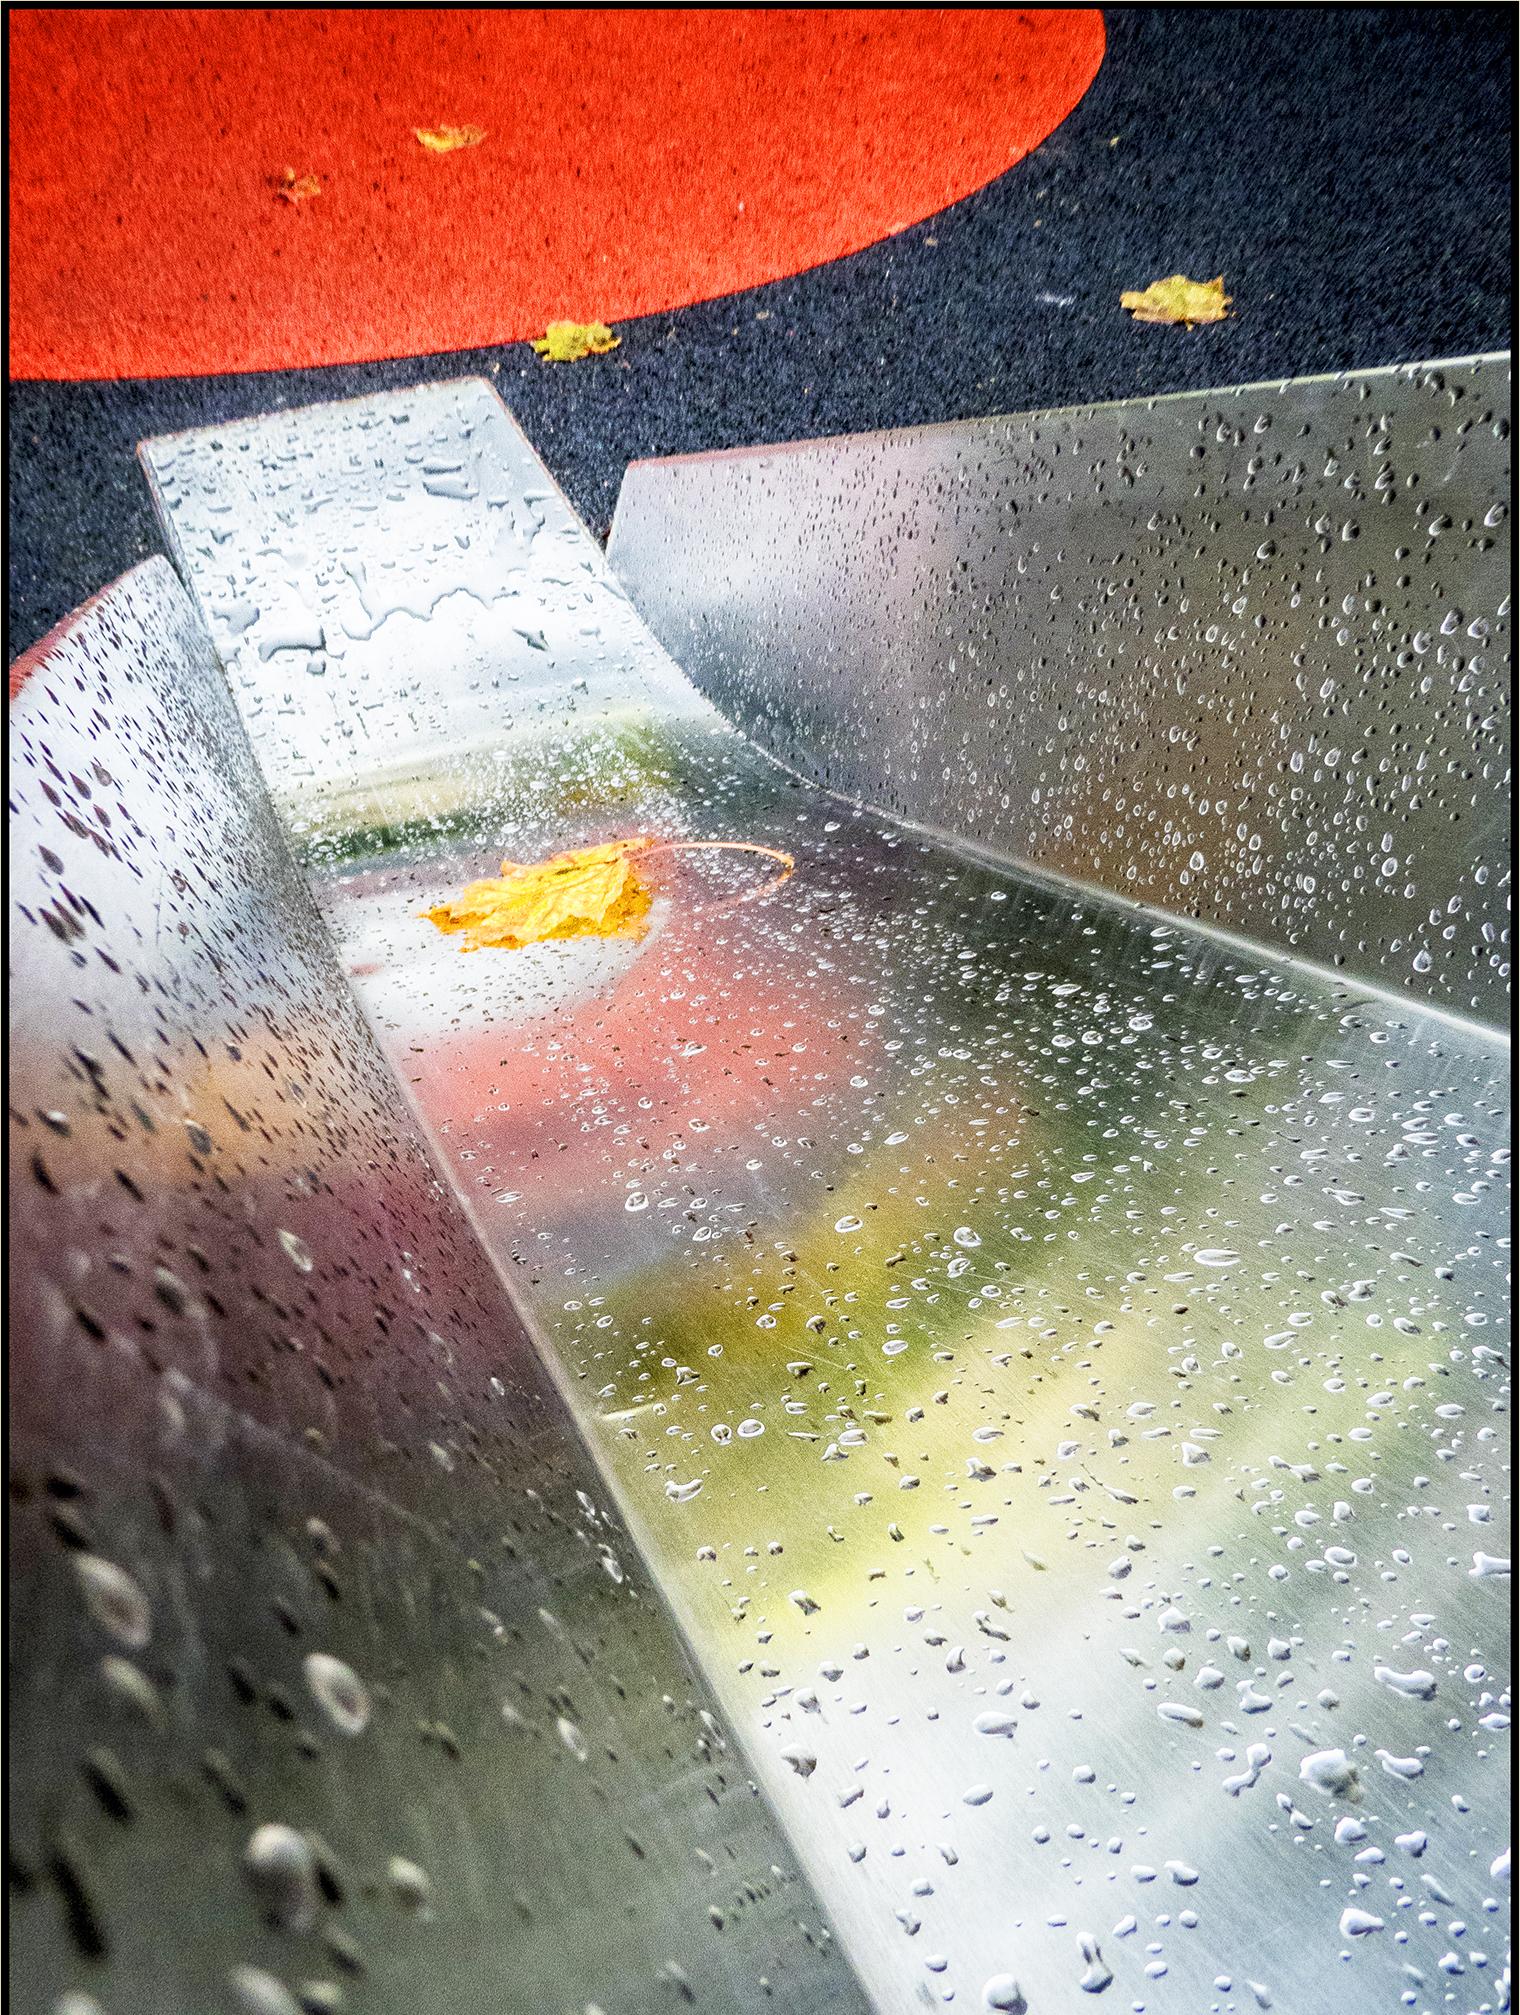 BATES JACK PLAYGROUND SLIDE AFTER RAIN Copy